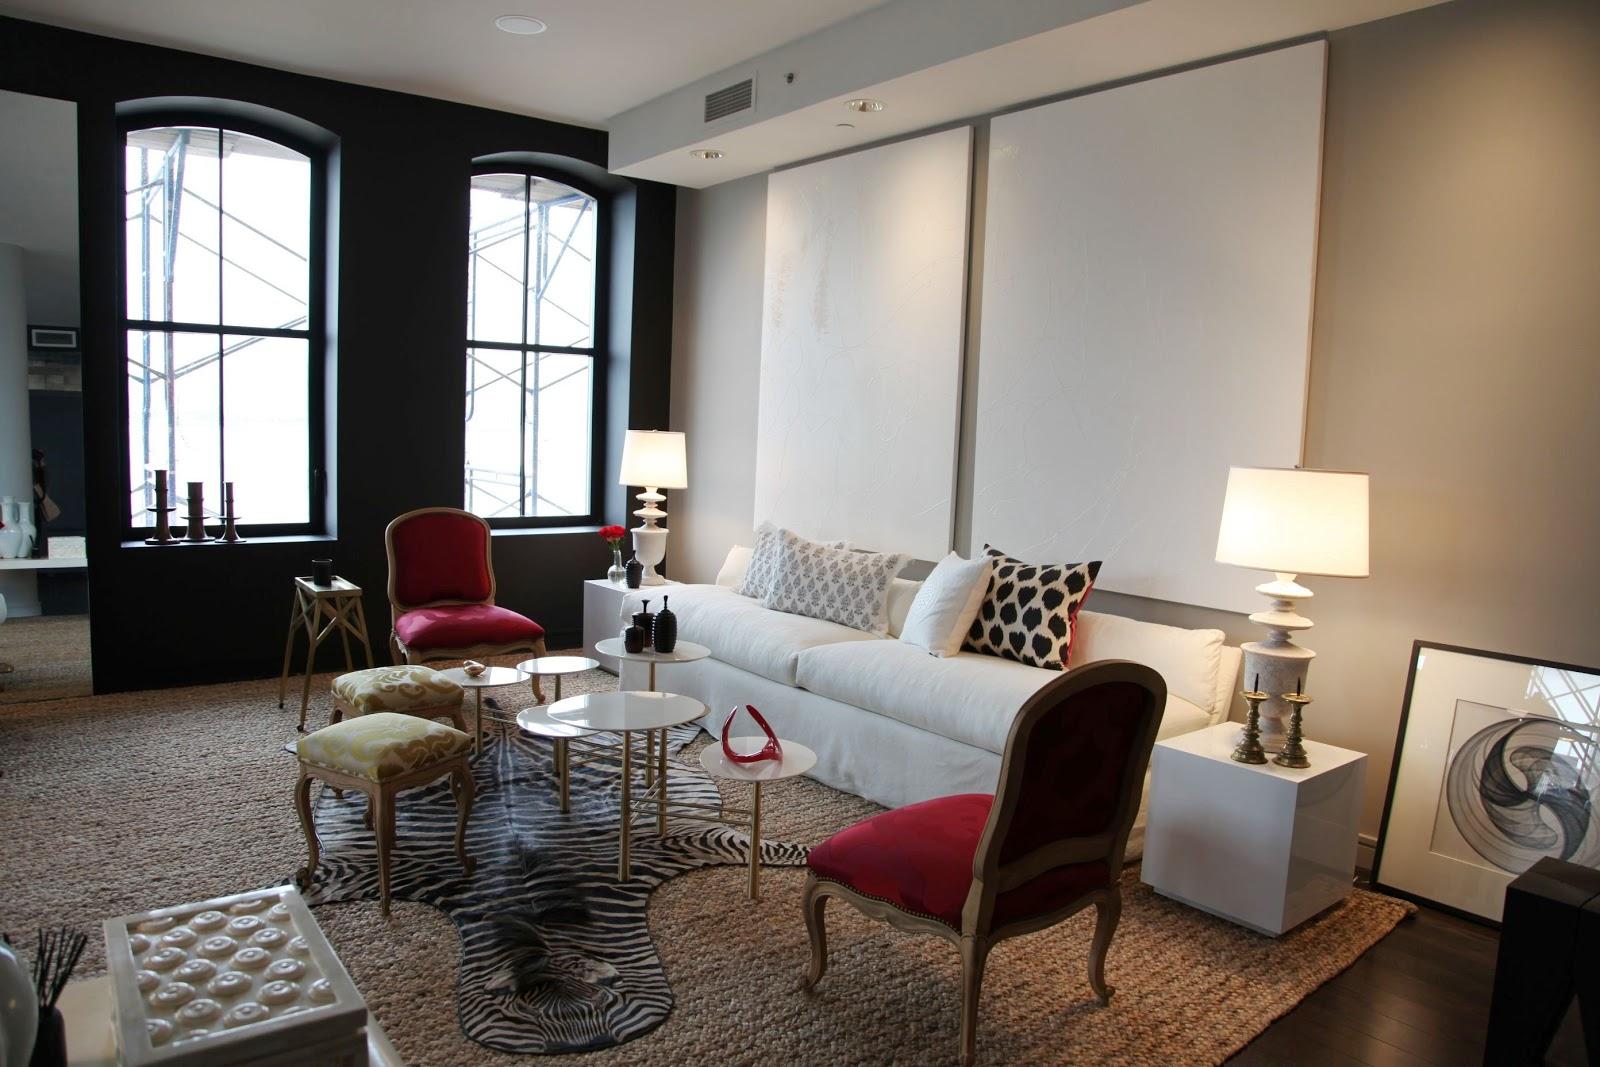 antony todd sofa 60 inch table console minima home hearst designer visions